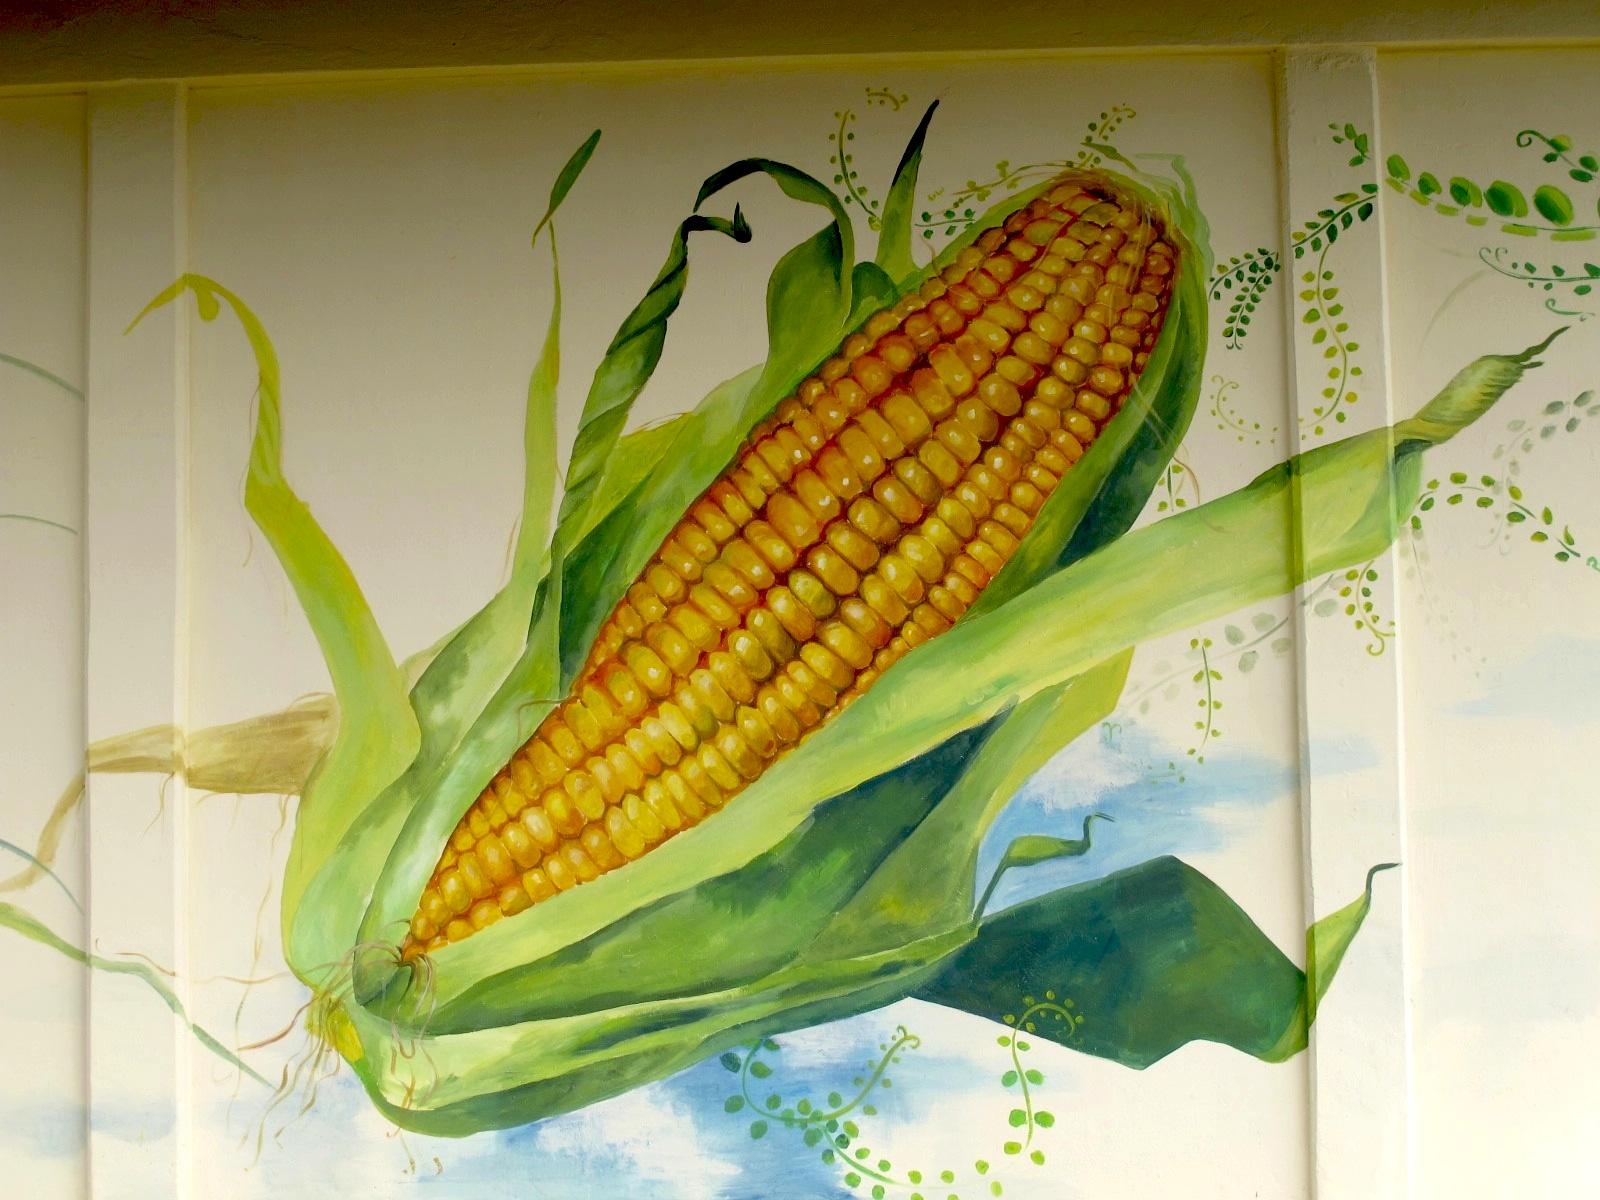 """St. Jude's food store"" - Gulu, Uganda"